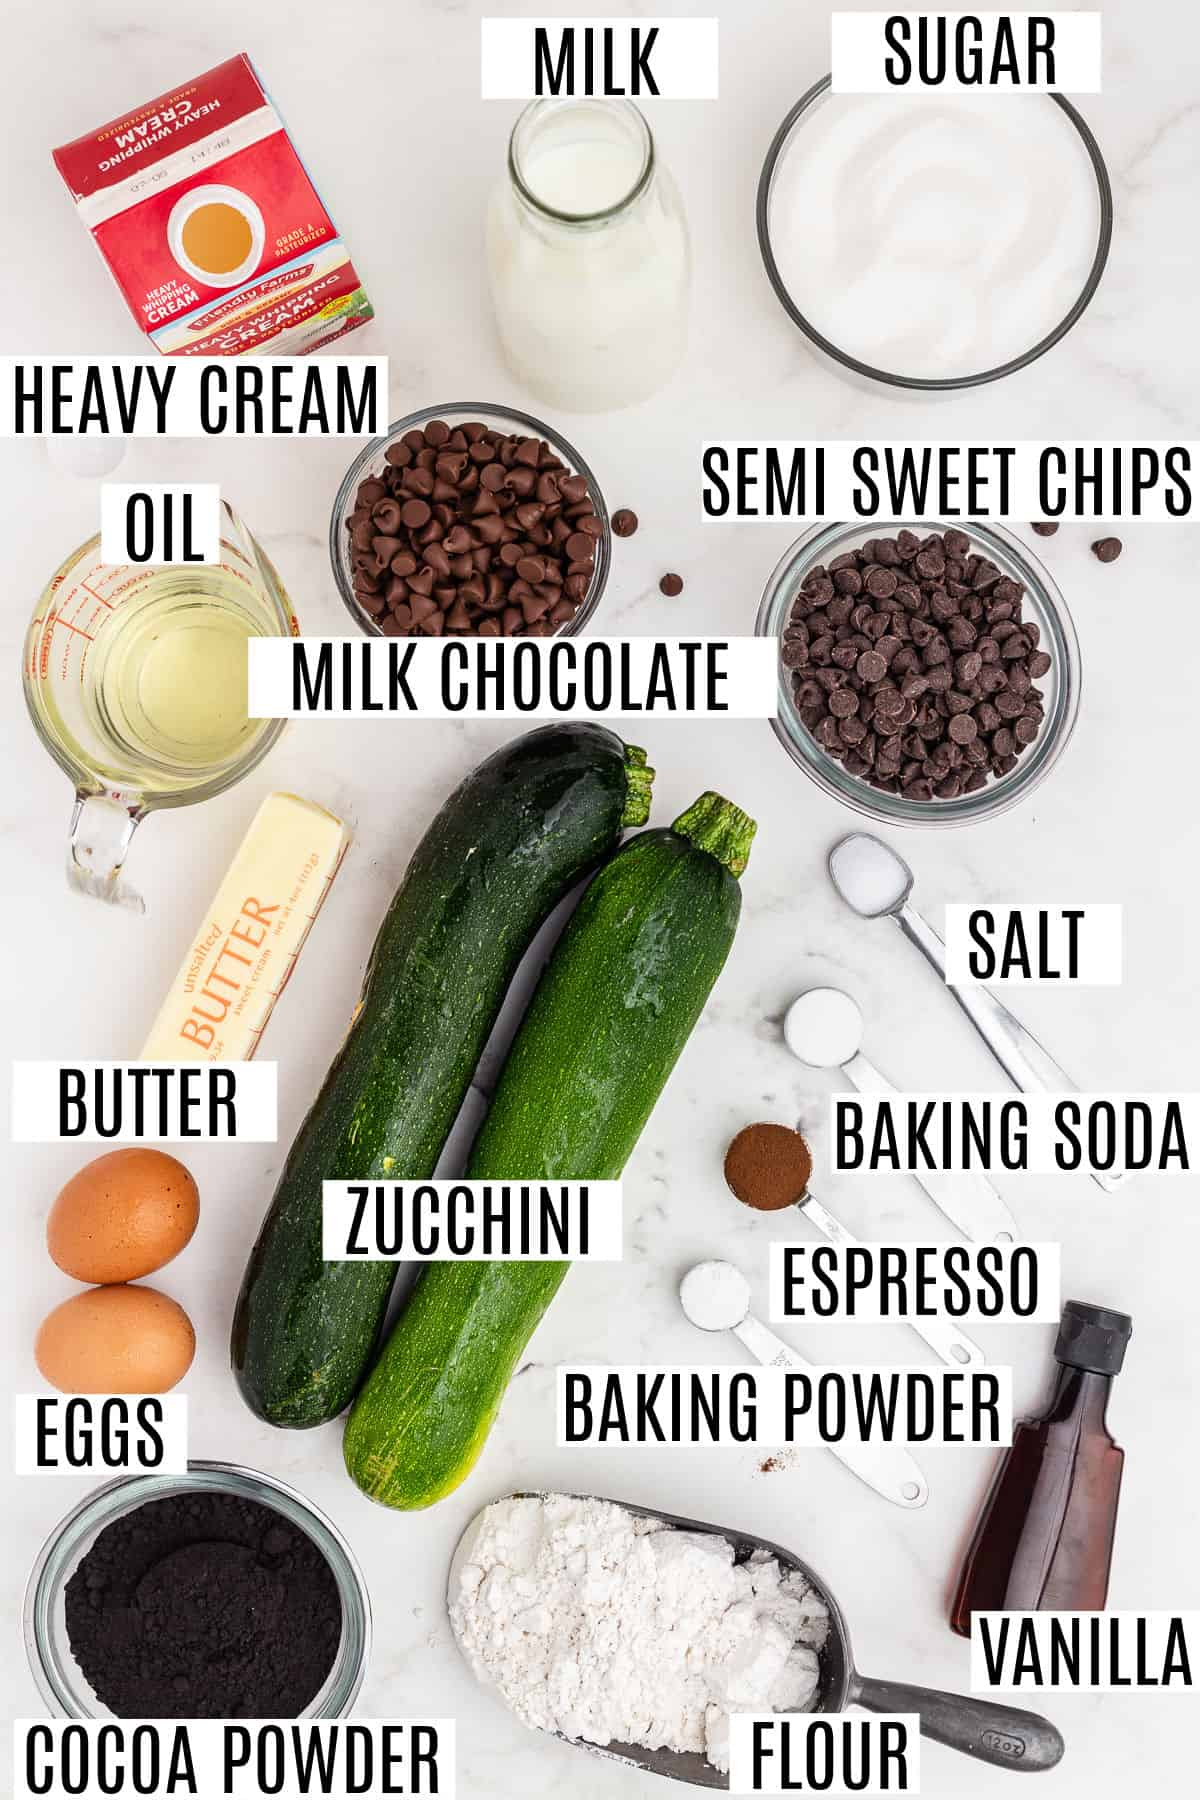 Ingredients needed for dark chocolate zucchini bundt cake recipe.